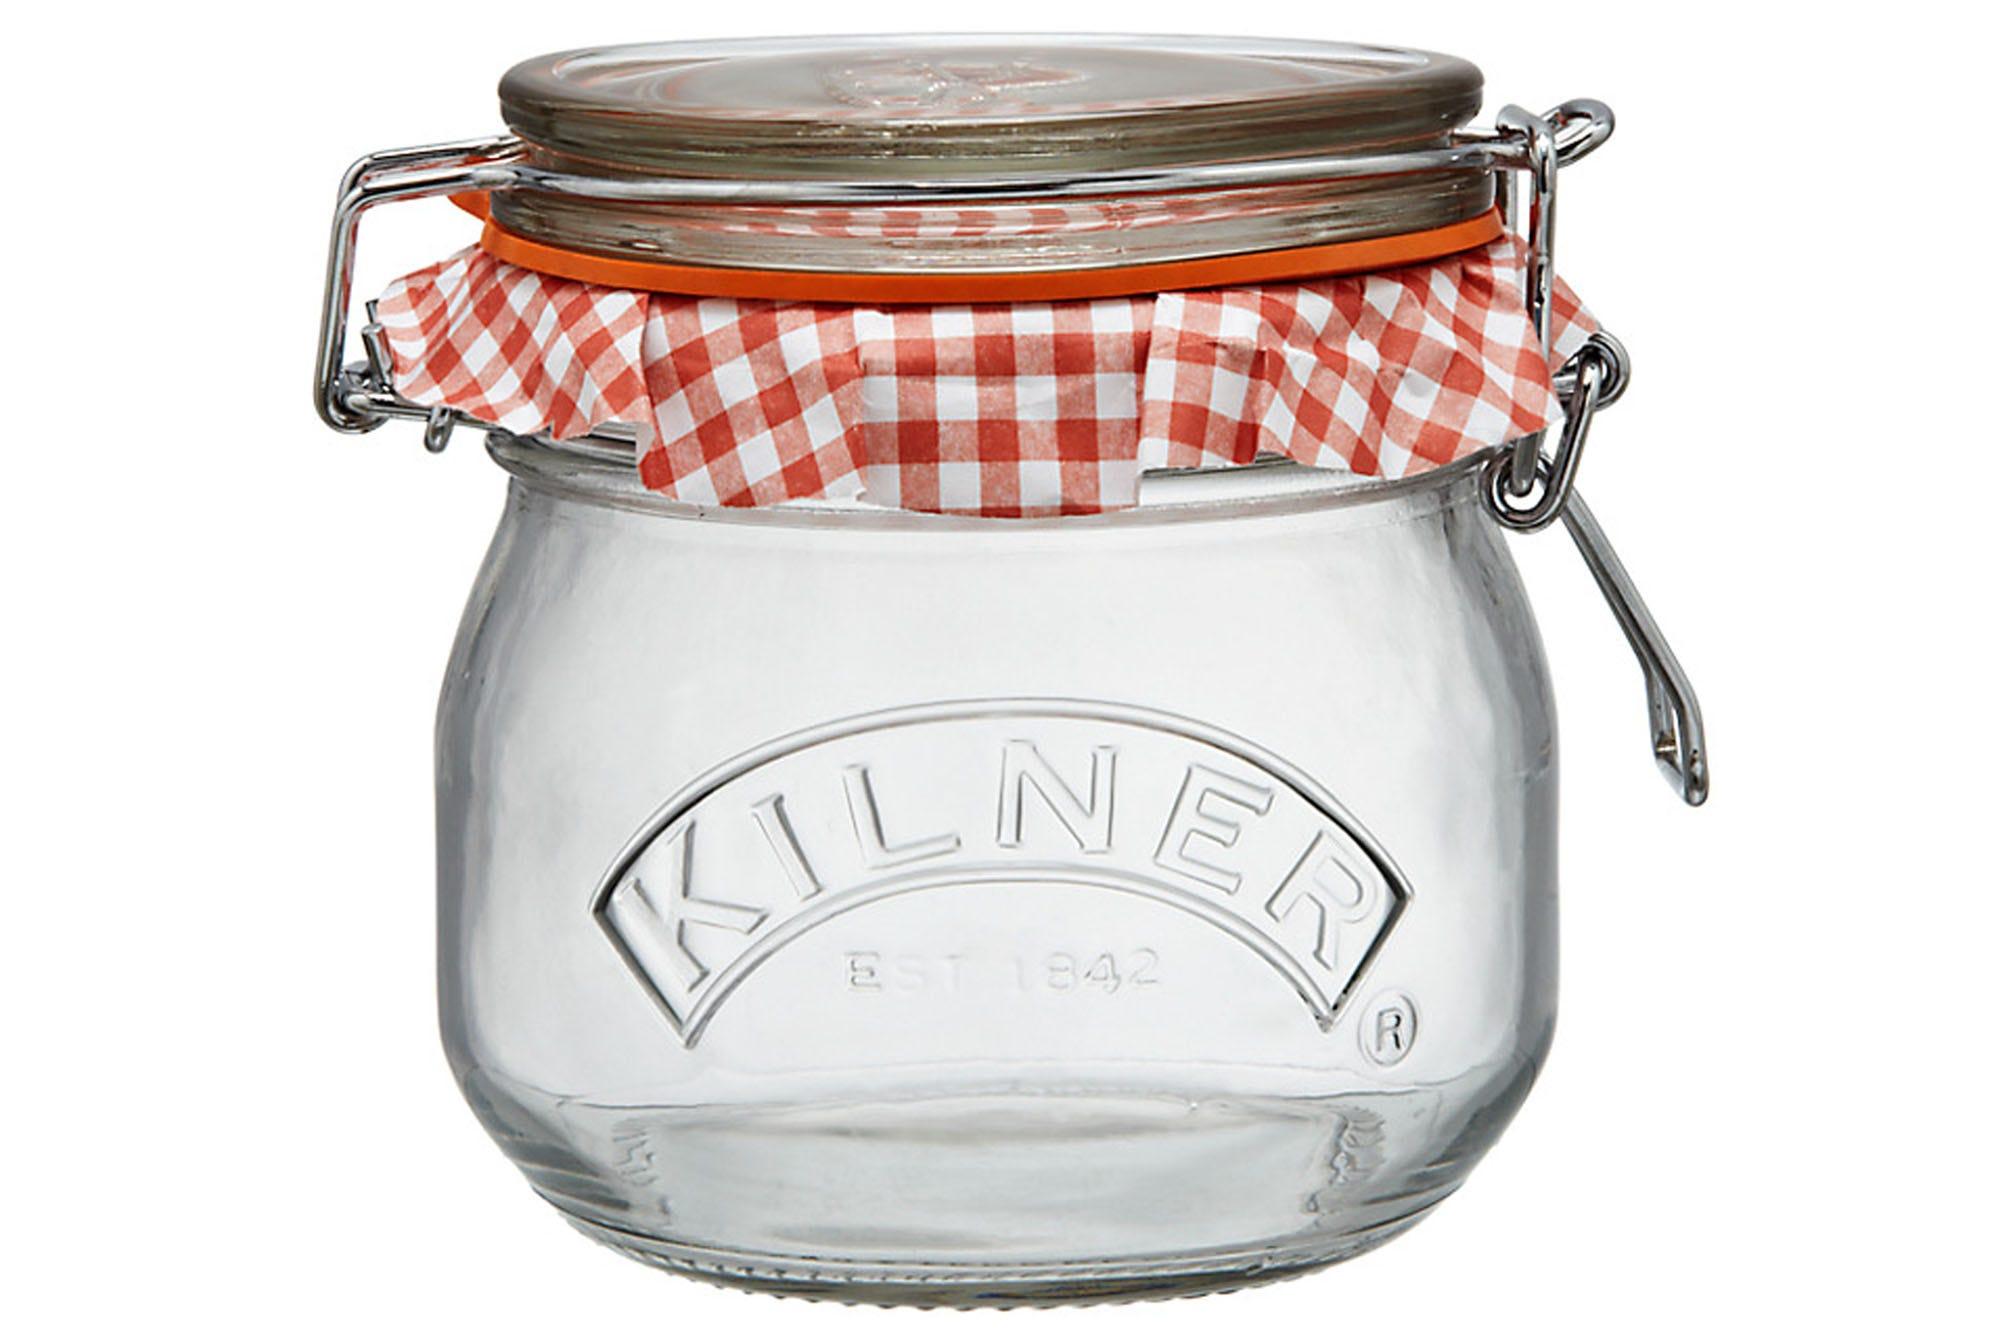 Compare prices for Kilner Preserve 0.5L Clip Top Round Jar